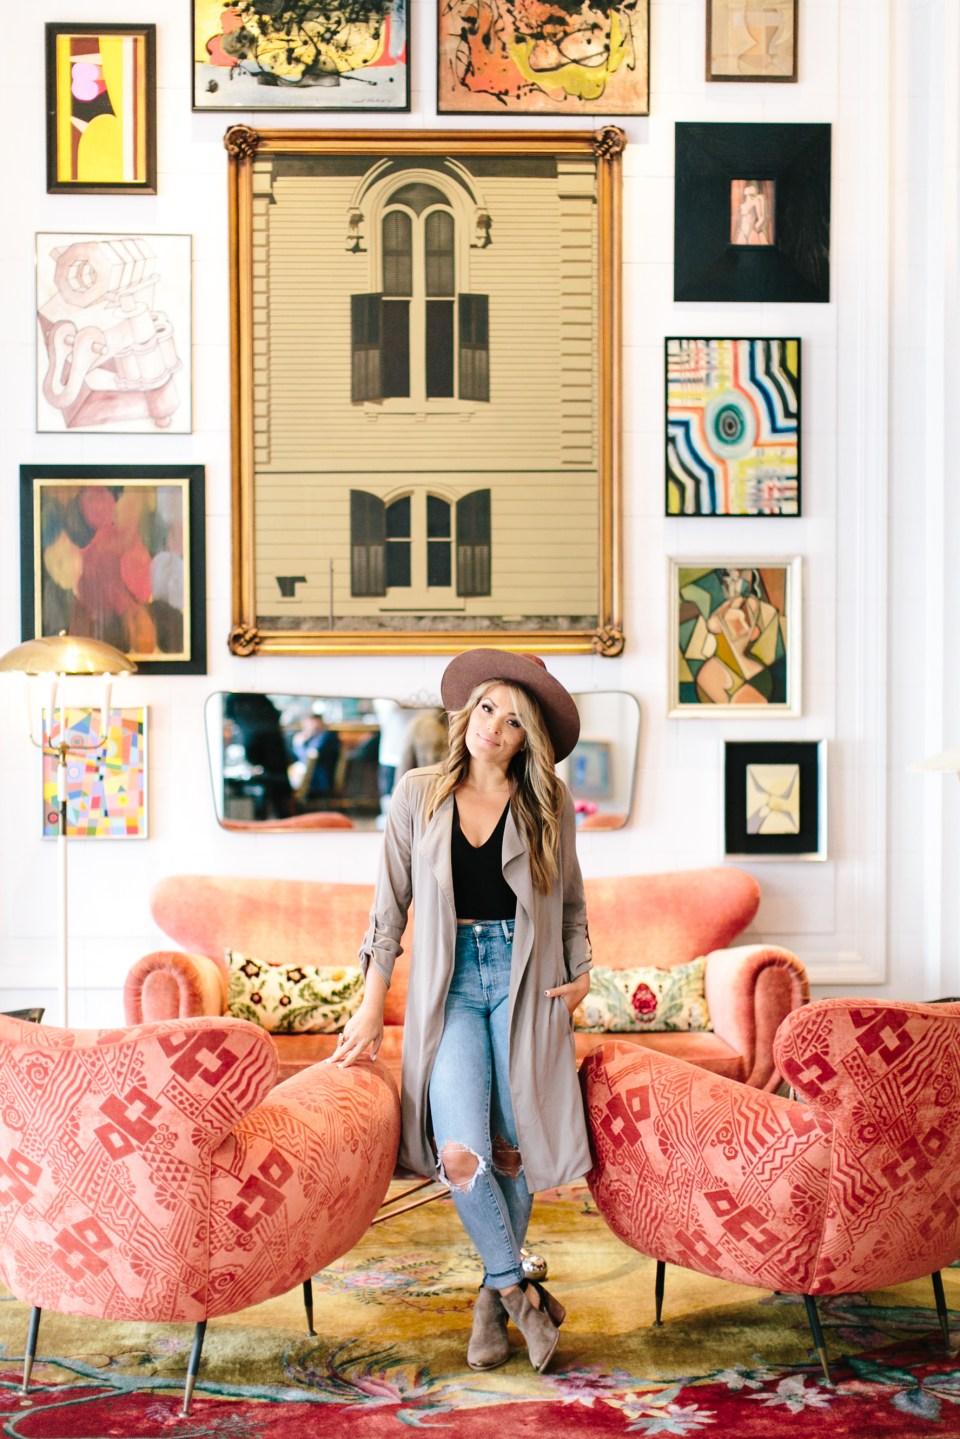 Jasmine Star - Social Curator - With Grace and Gold - With Grace Movement #WITHGRACEMOVEMENT Interview - 3